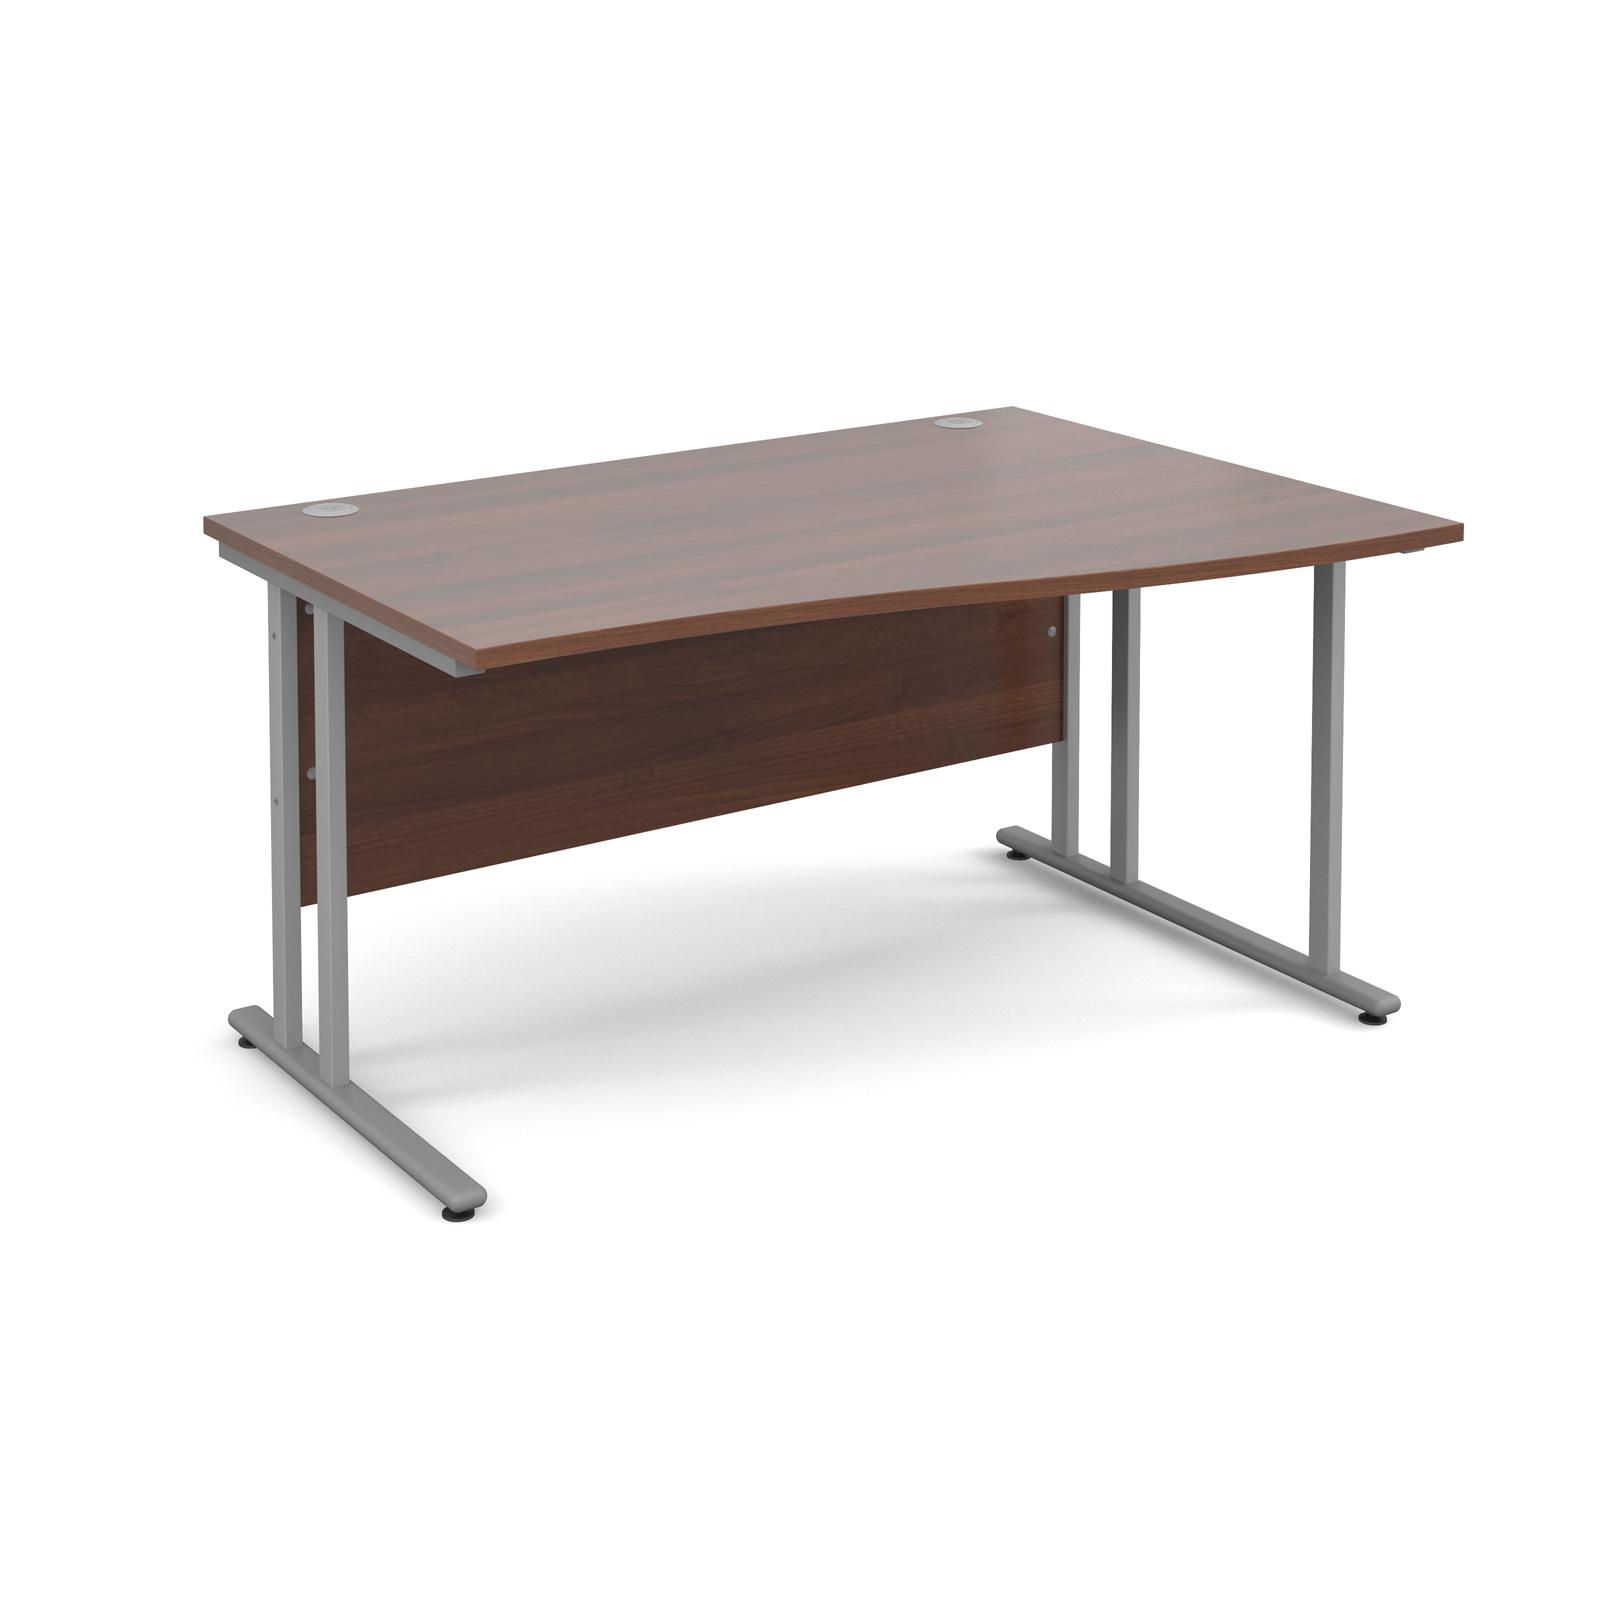 Maestro 25 SL right hand wave desk 1400mm - silver cantilever frame, walnut top